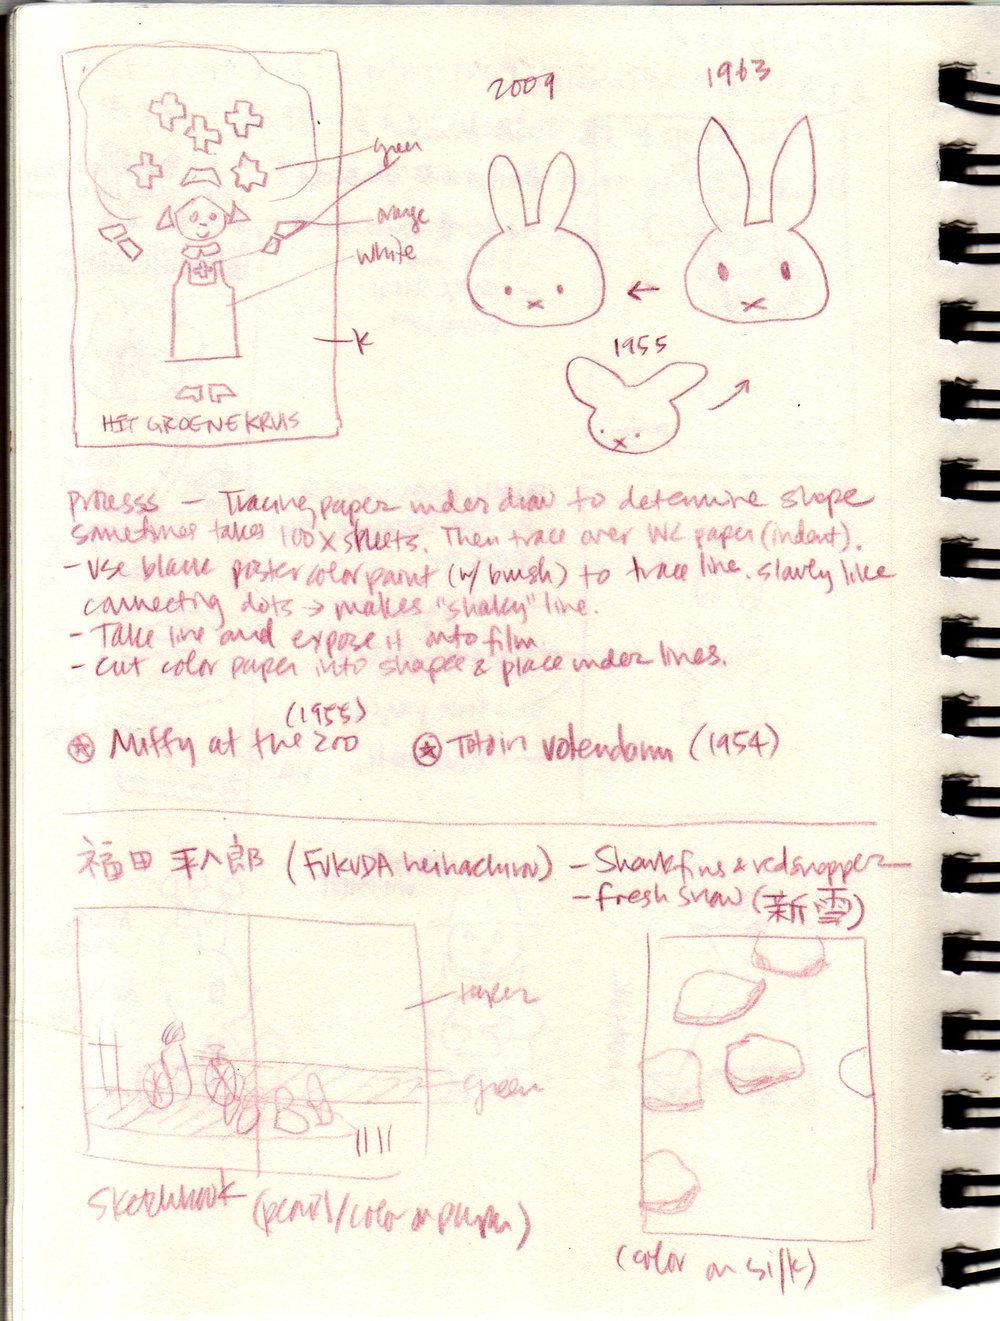 More Dick Bruna notes